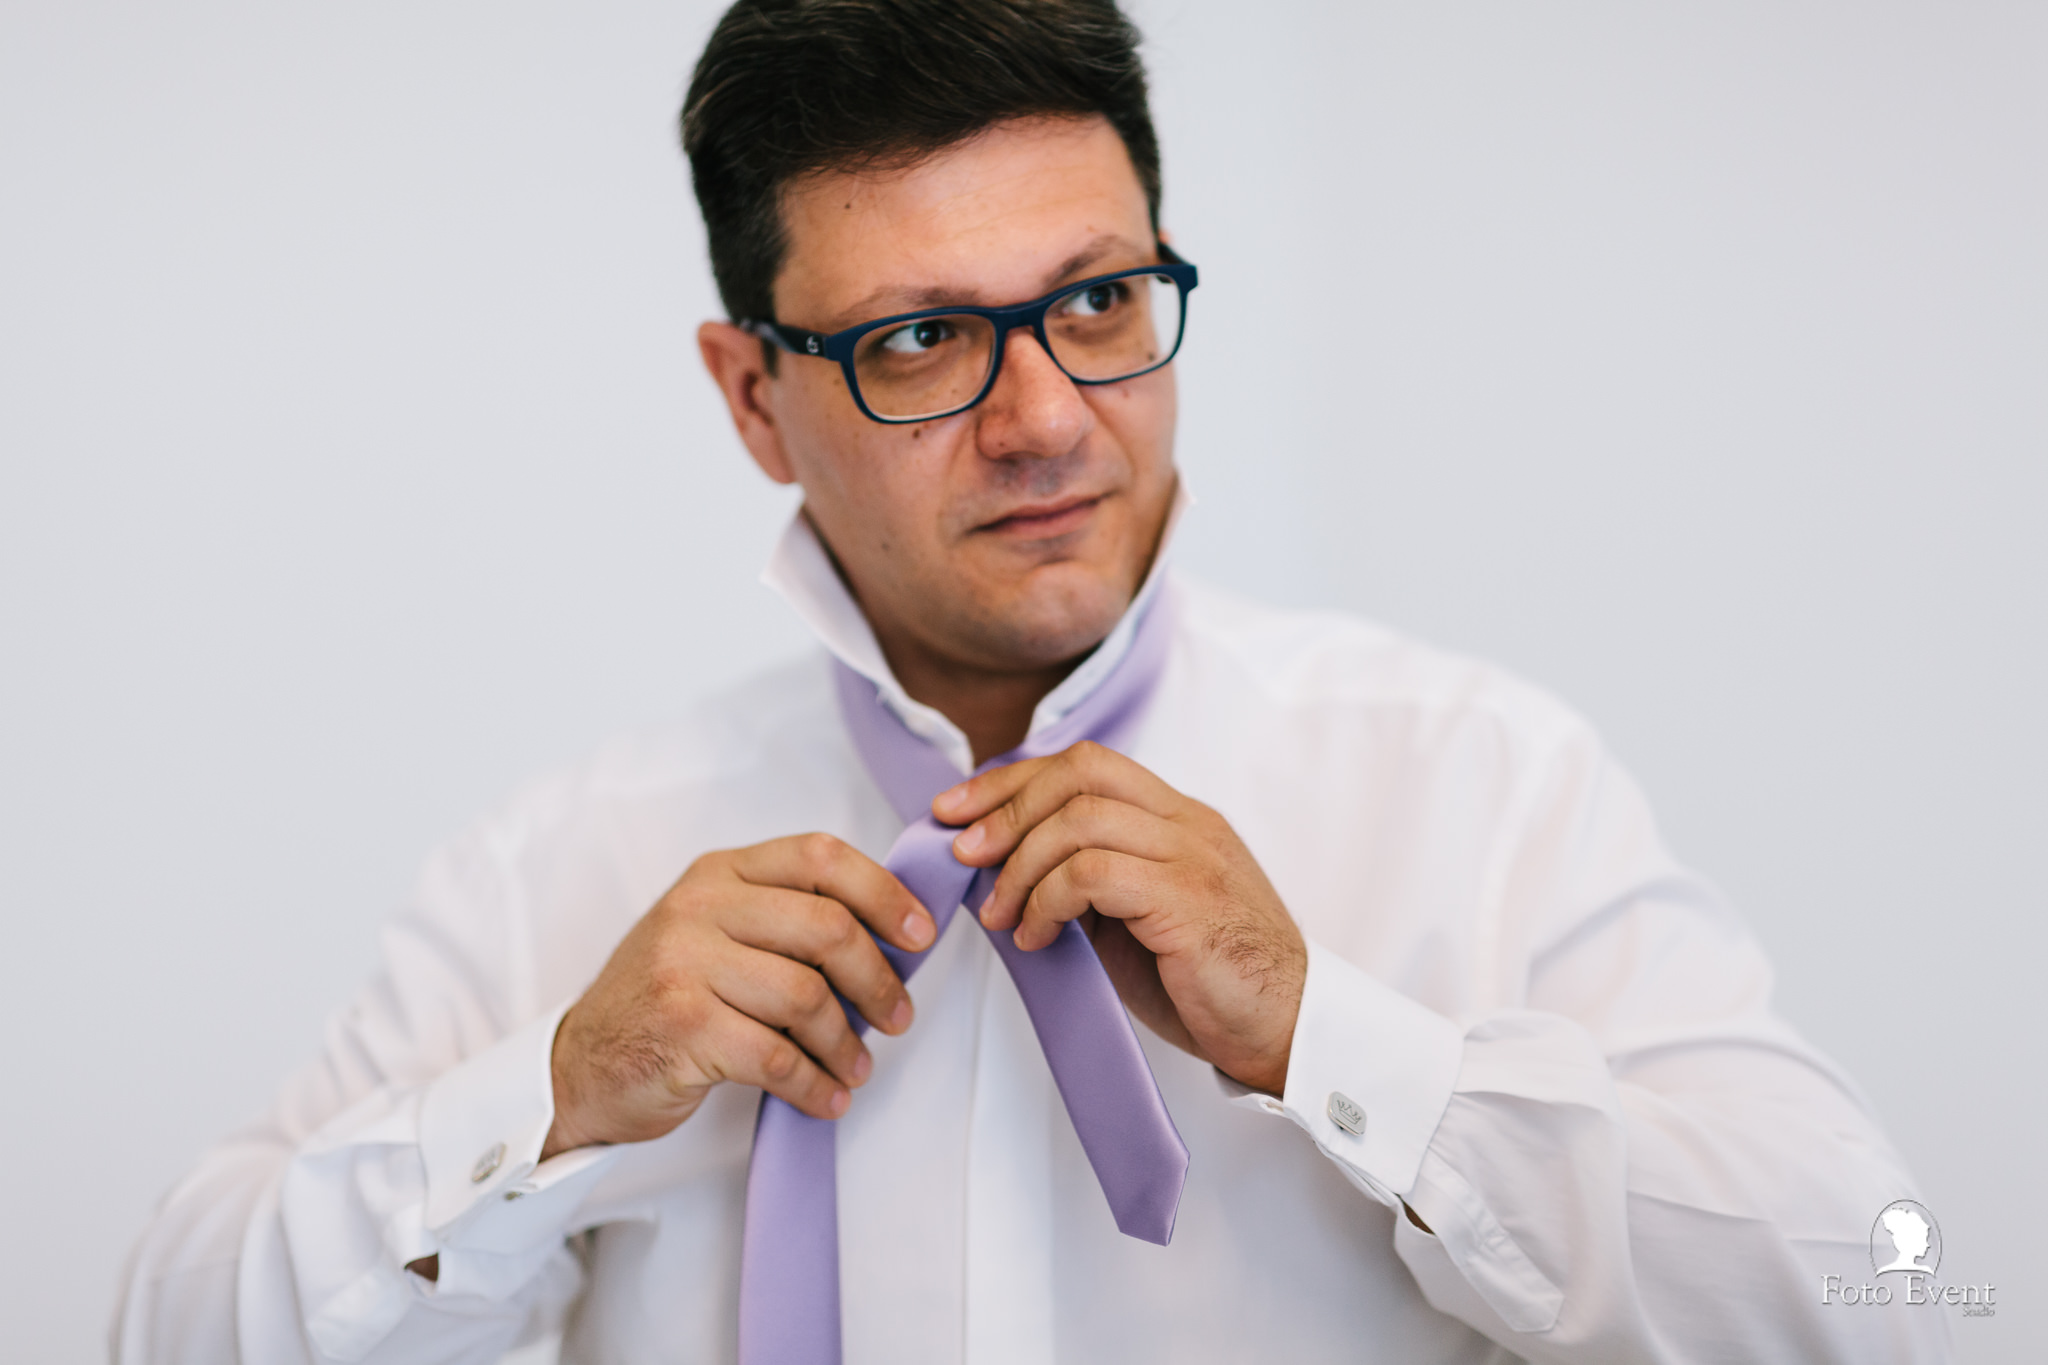 004-2019-07-27-Matrimonio-Valentina-e-Alessandro-Pettinari-80mm-038